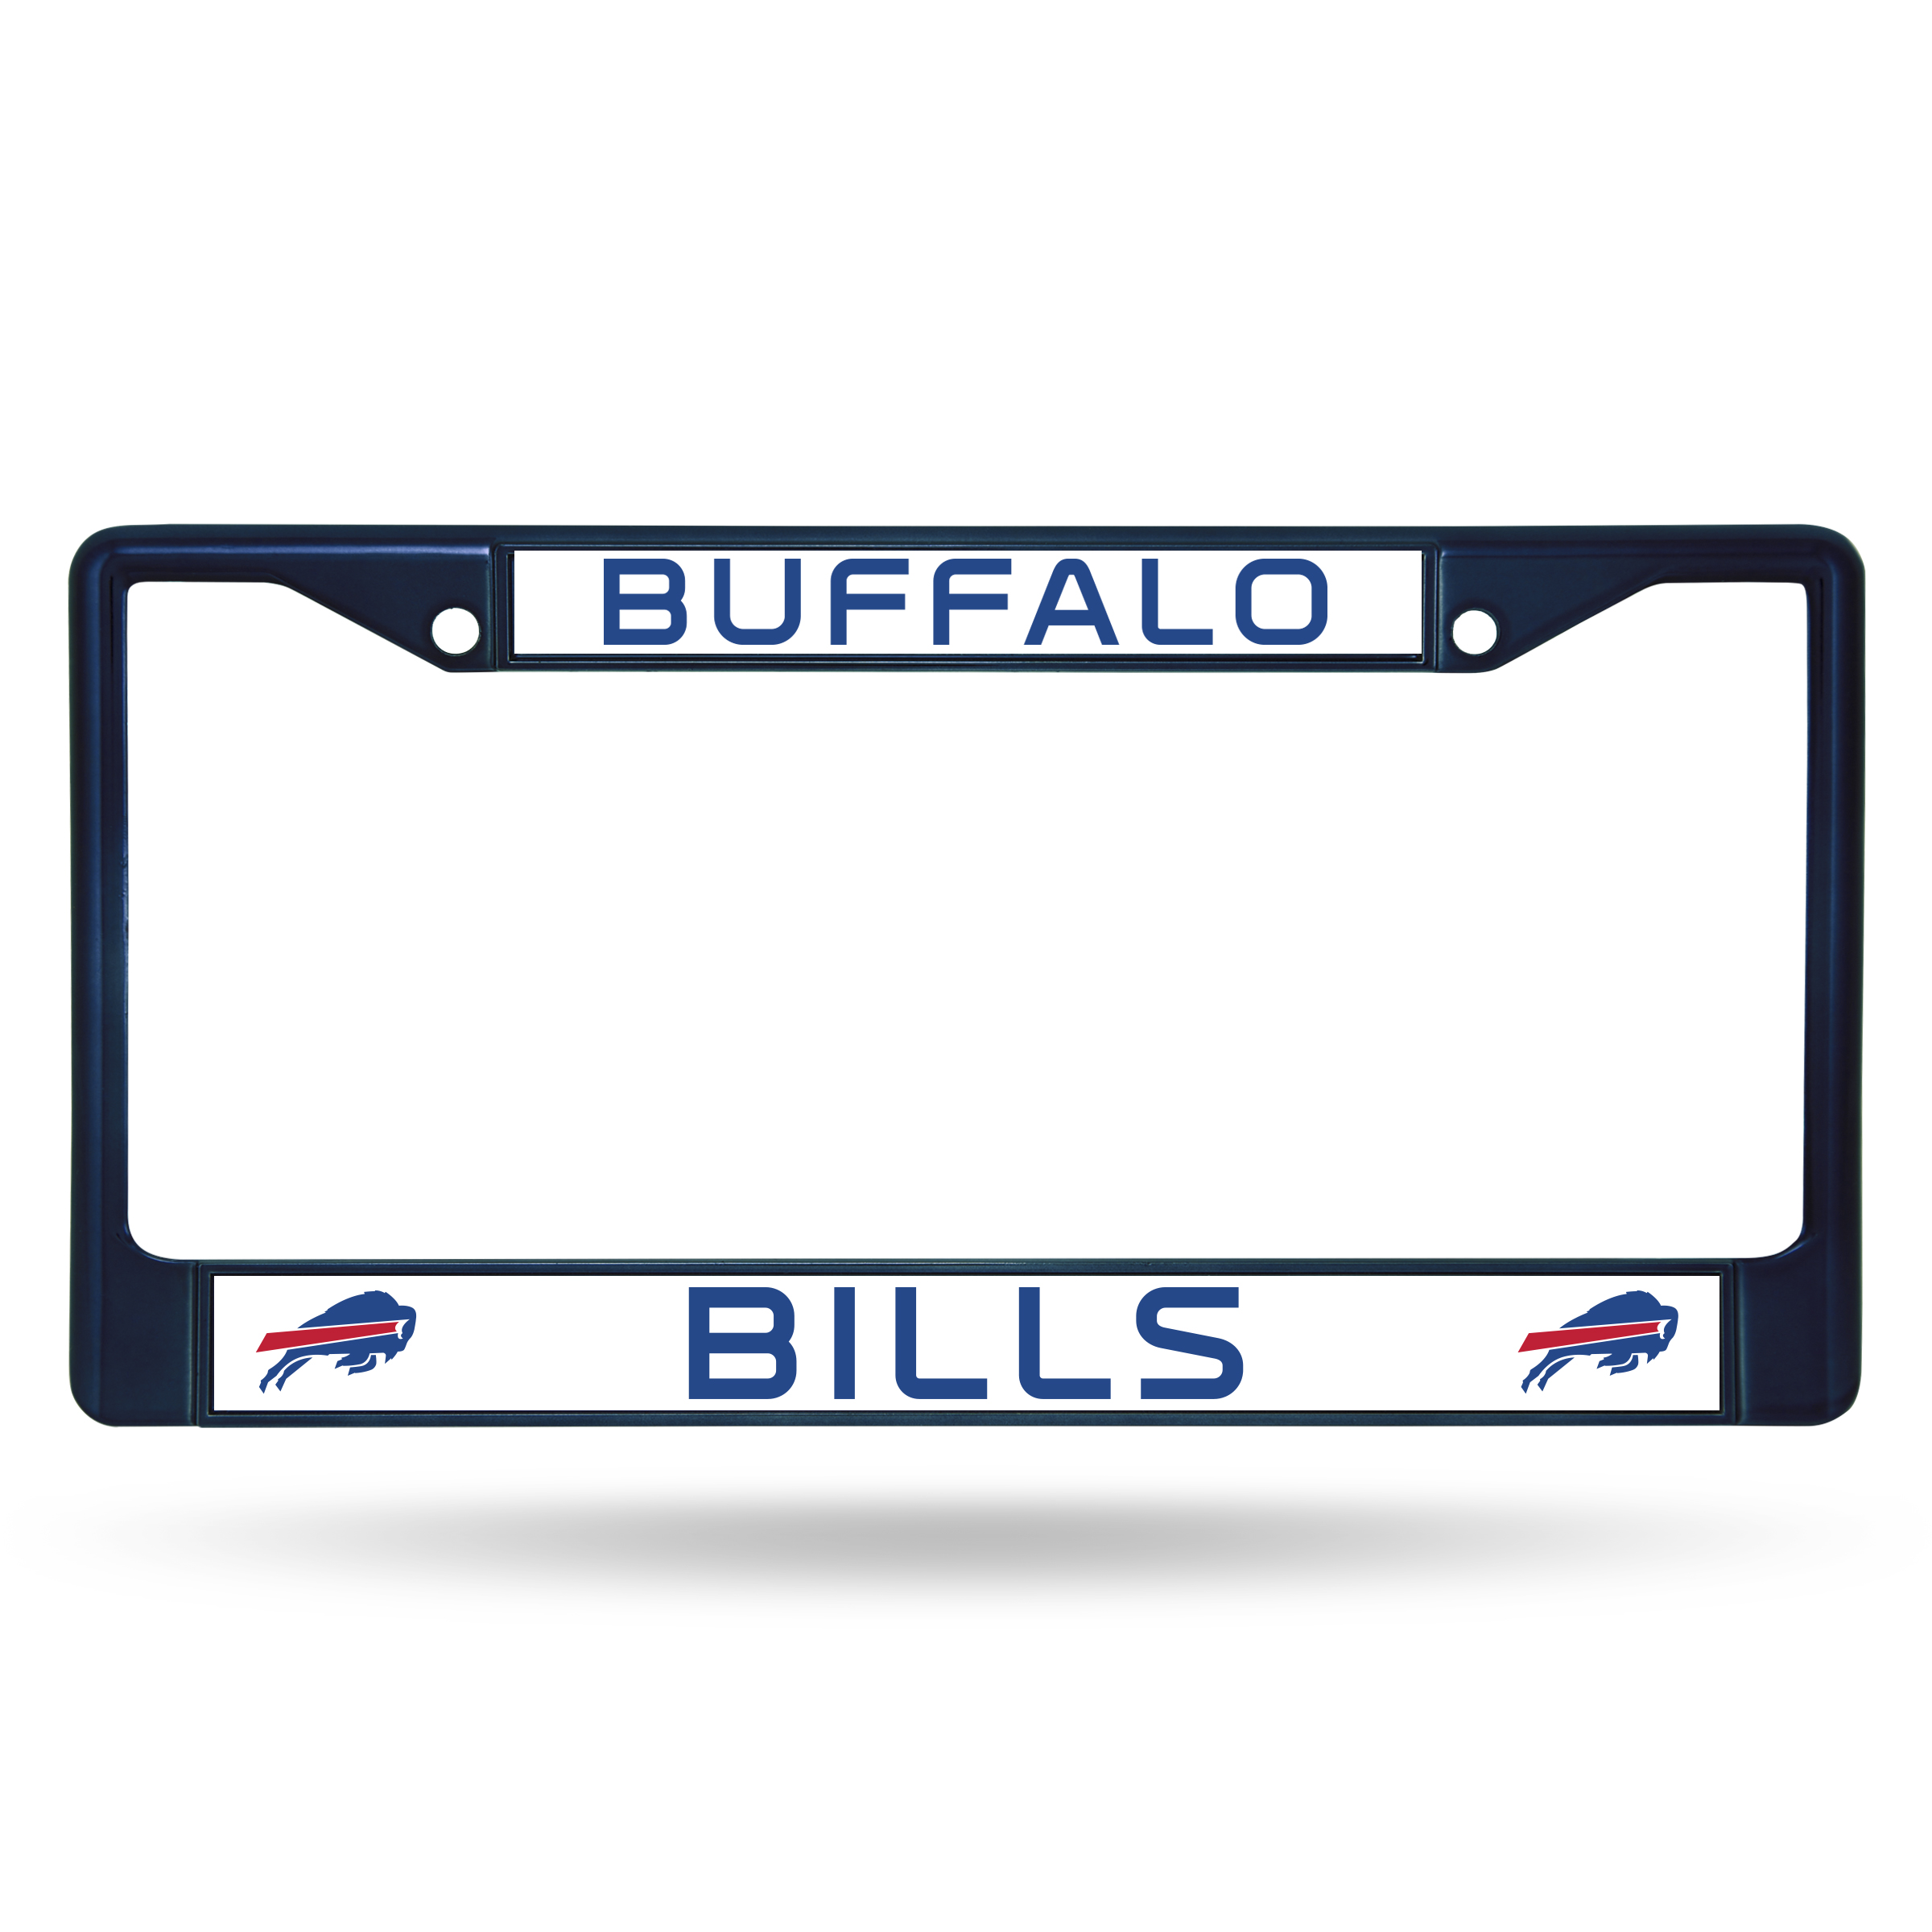 Buffalo Bills Metal License Plate Frame - Navy